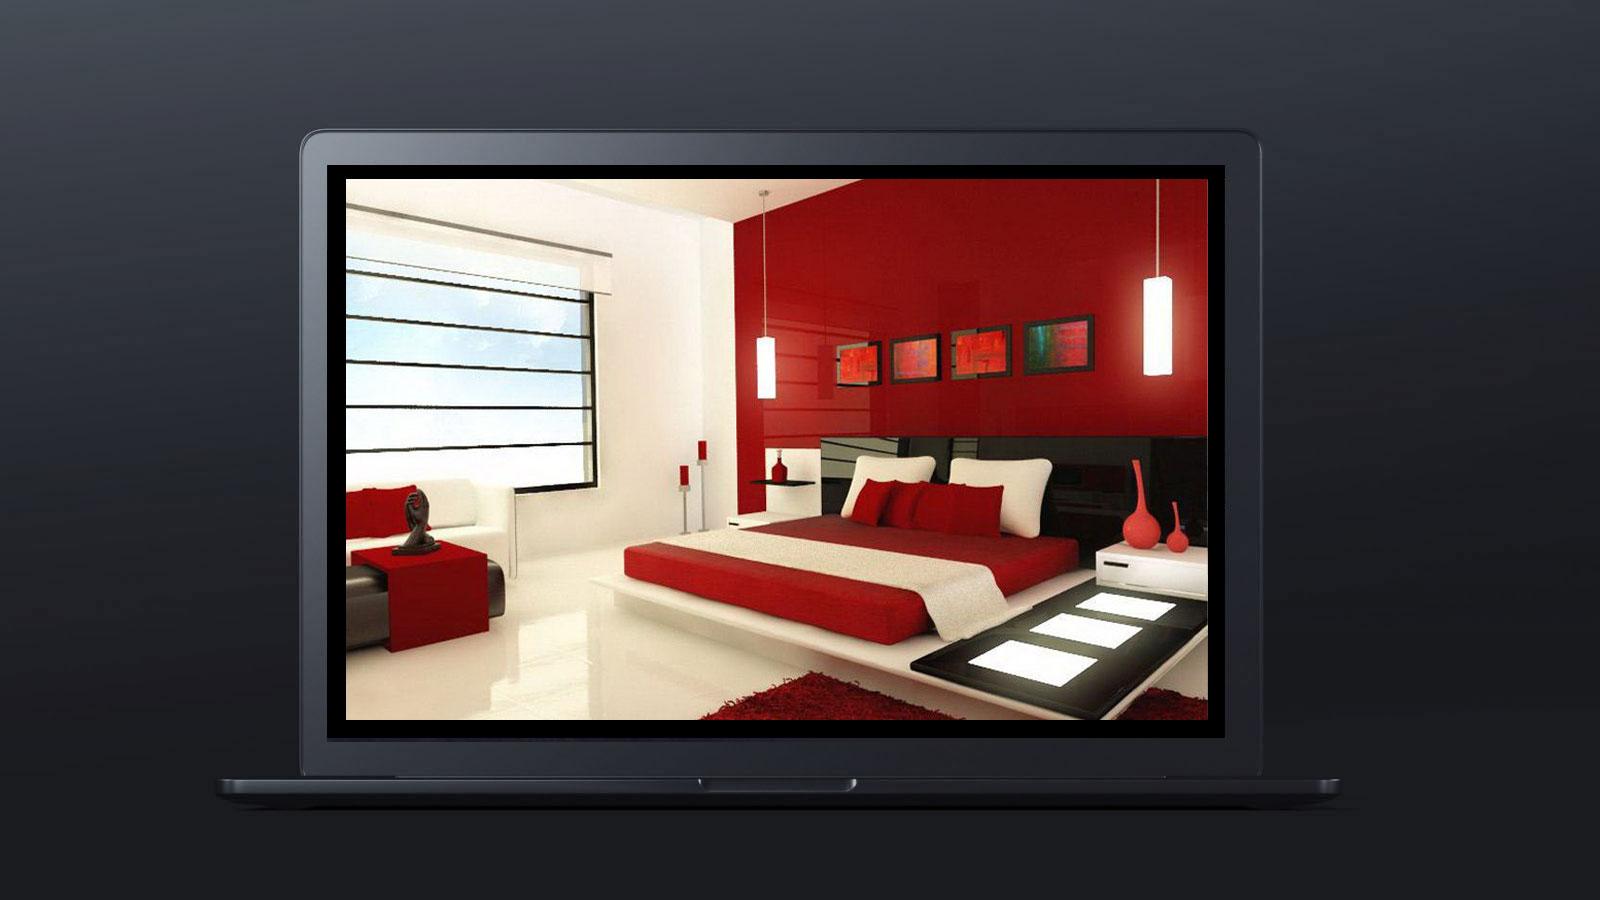 Design Color 4 - نقش رنگ و رنگ آمیزی در دکوراسیون داخلی